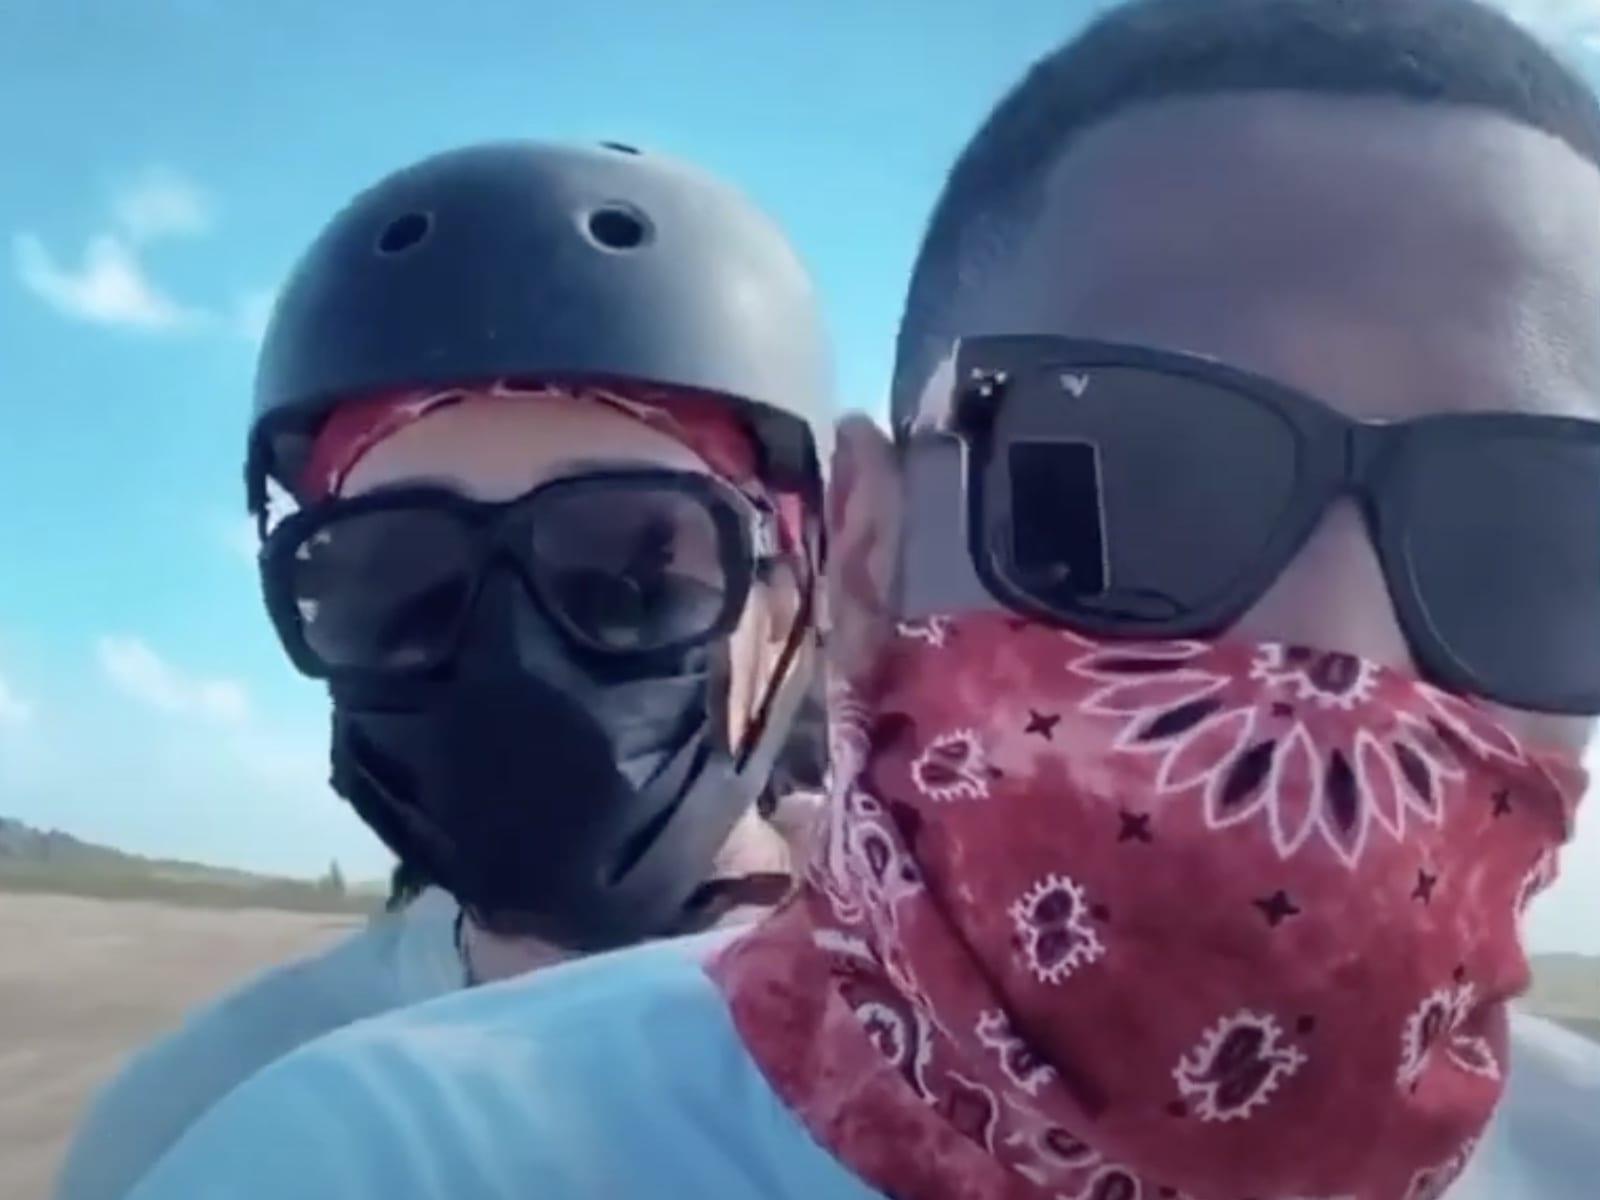 Emily B + Fabolous Ride ATVs Together In Aruba W: Jim Jones + Chrissy Lampkin 2